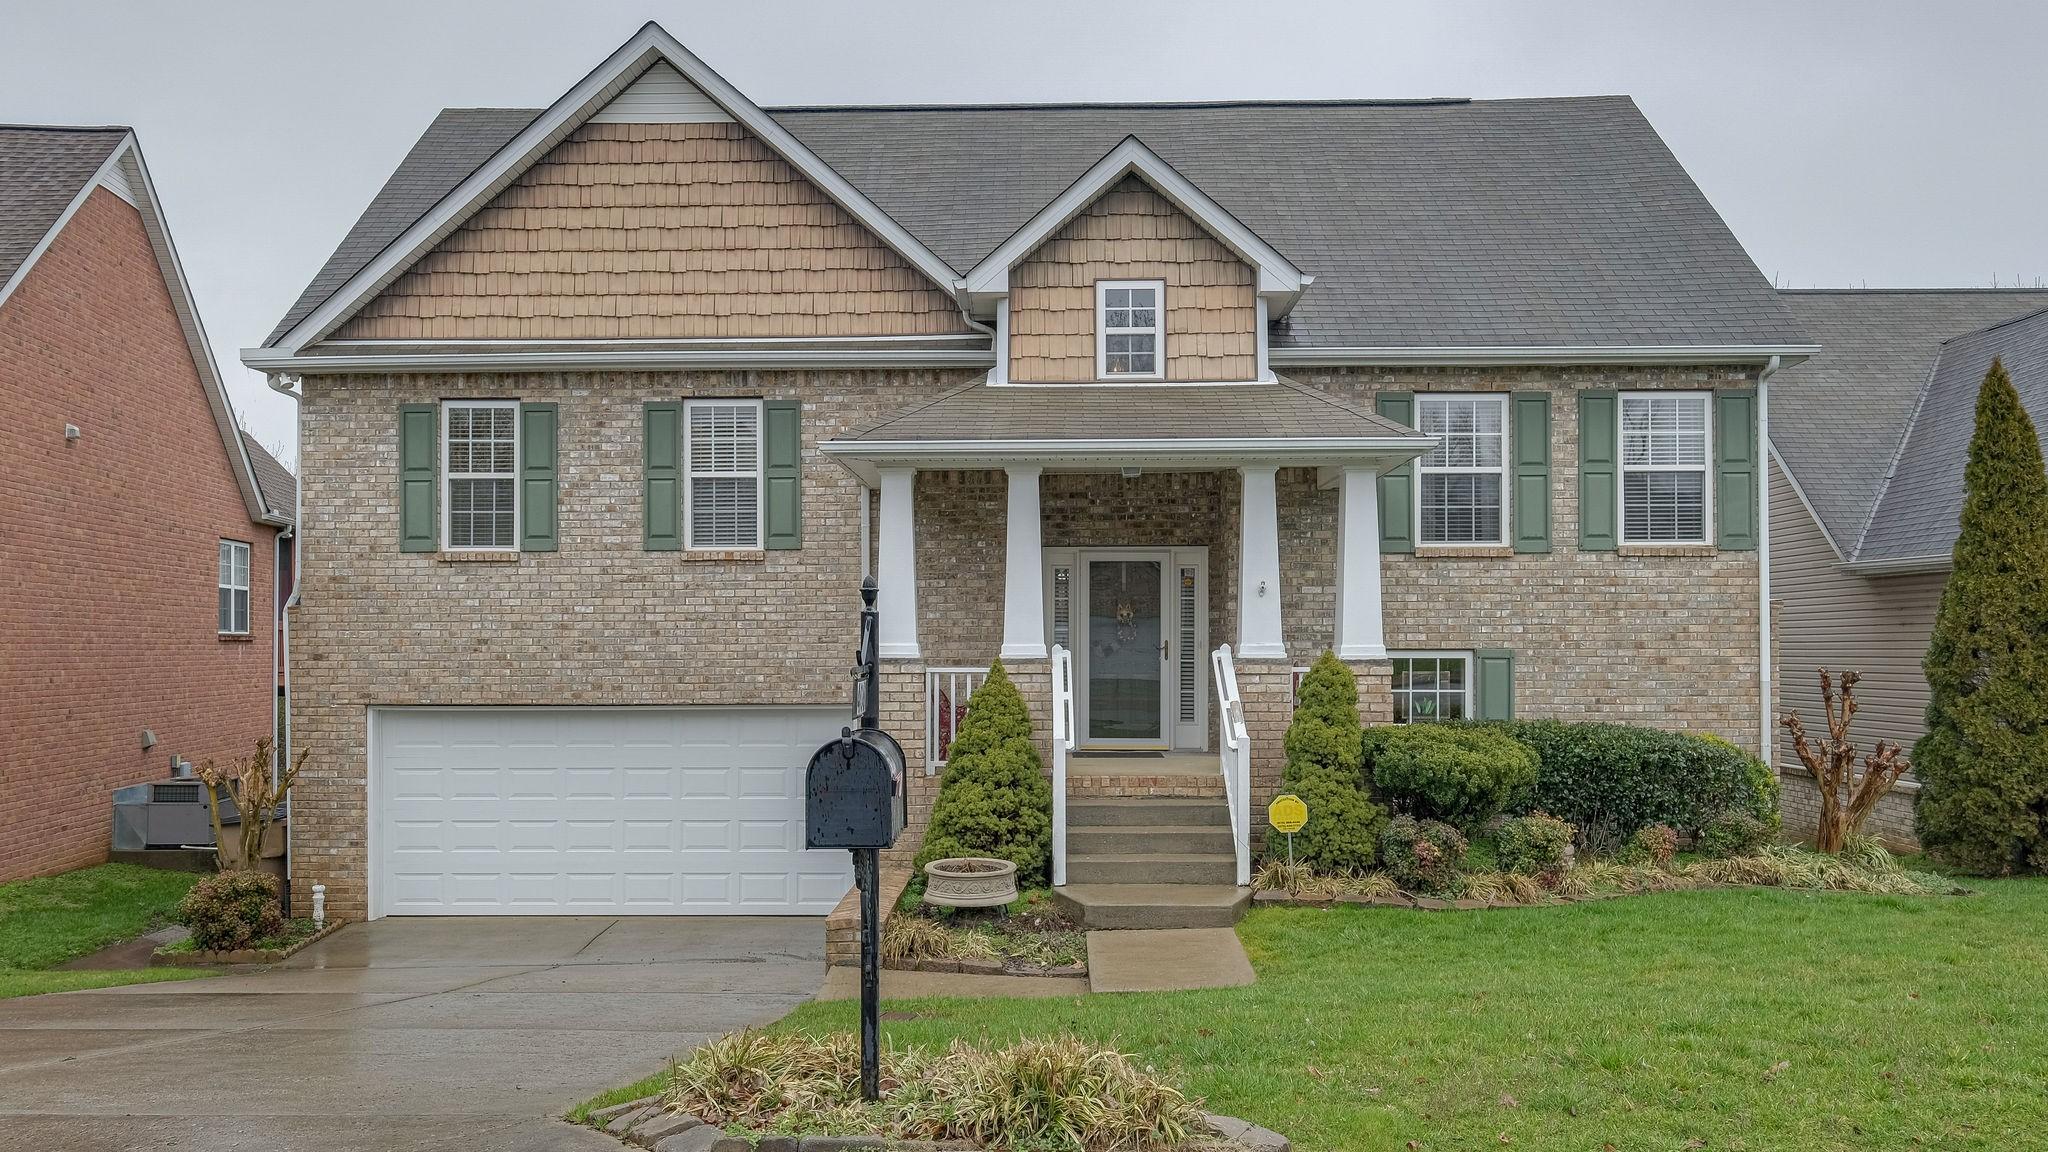 4061 Pineorchard PL, Antioch, TN 37013 - Antioch, TN real estate listing